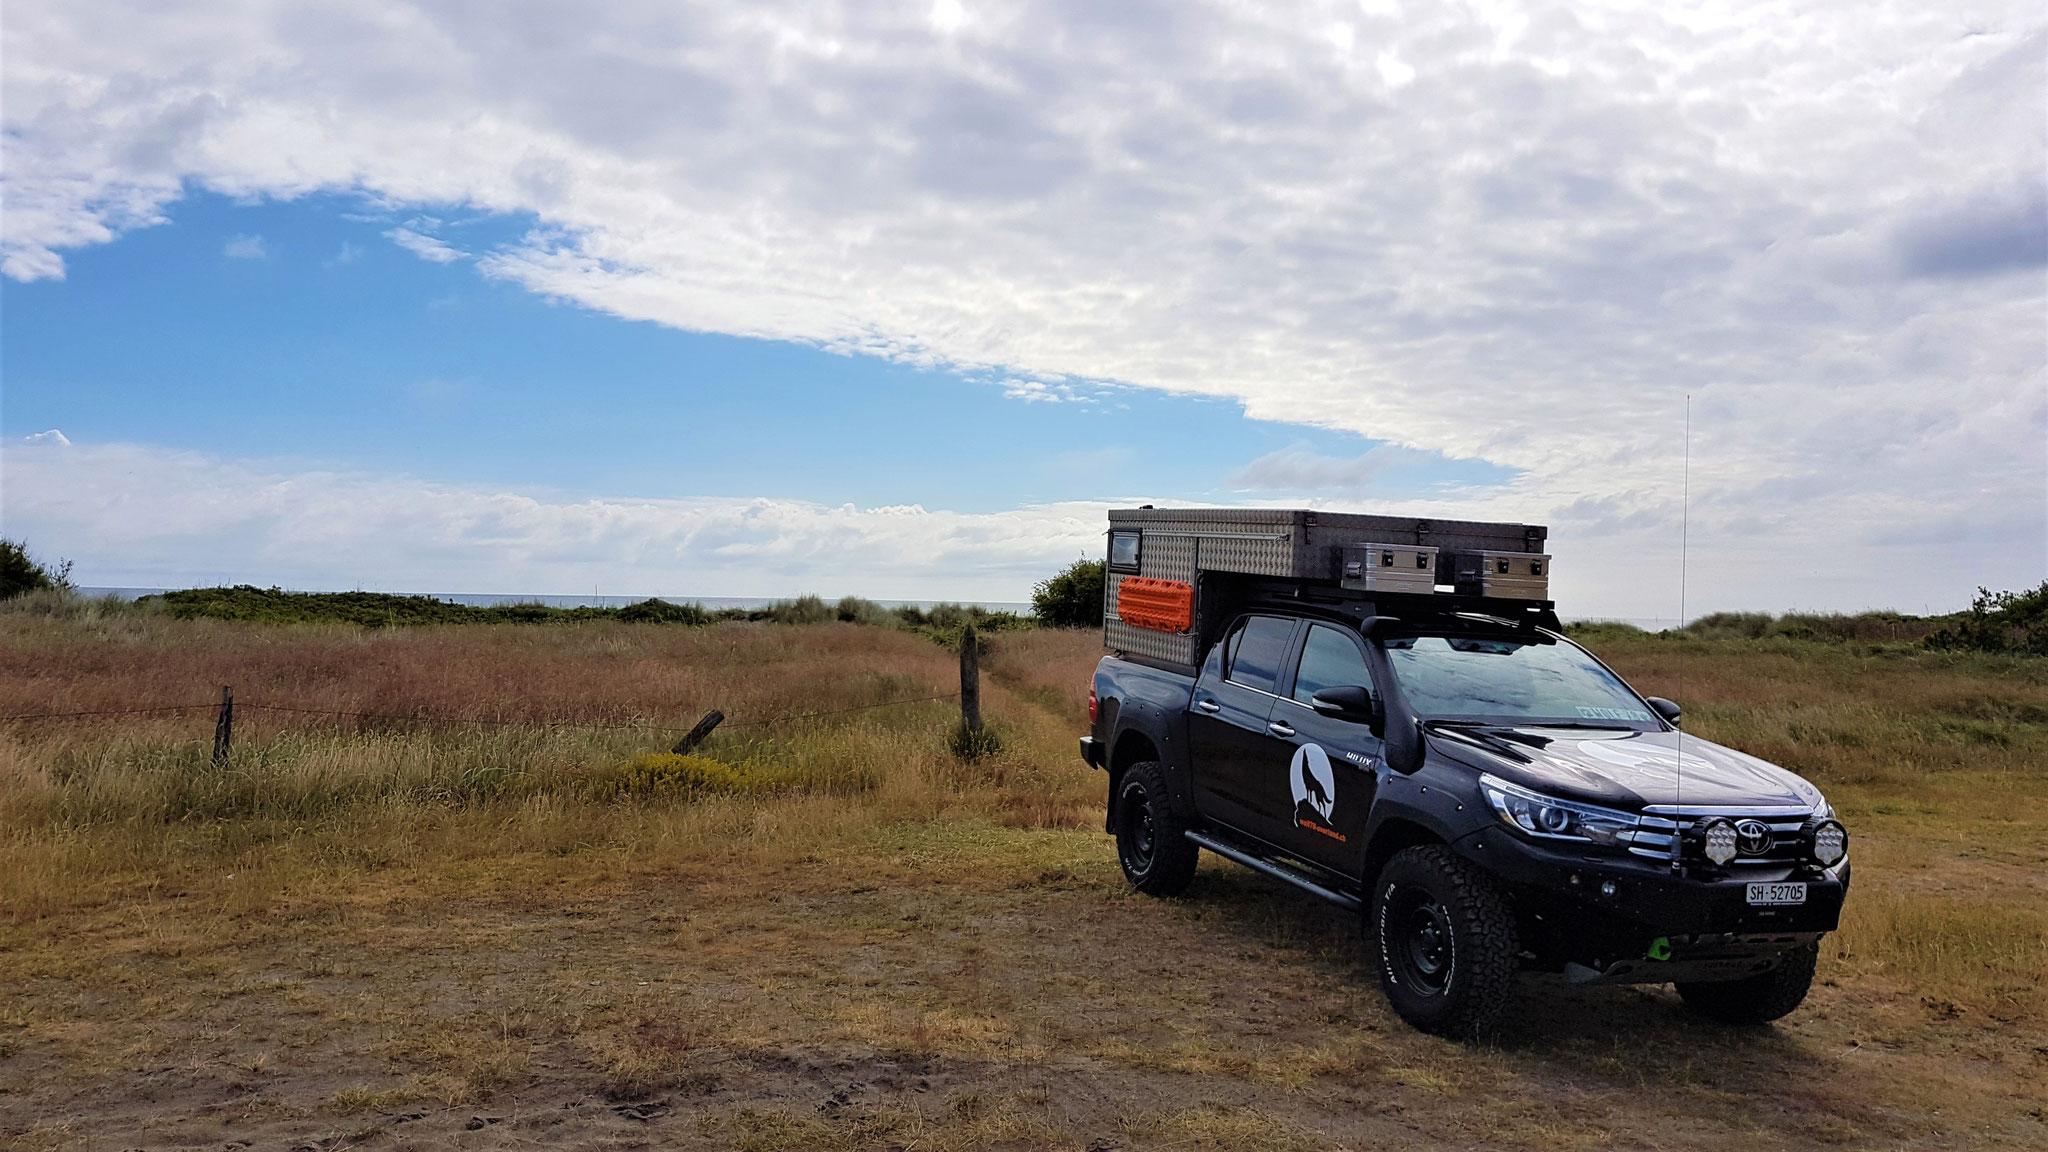 Dänemark Pickup-camper Strand Toyota Hilux Arctic Trucks Skandinavien #ProjektBlackwolf wolf78 explore without no limits offroad overland Travel Camping 4x4 AFN4x4 frontrunneroutfitters #BornToRoam Rival4x4 wolf78-overland.ch